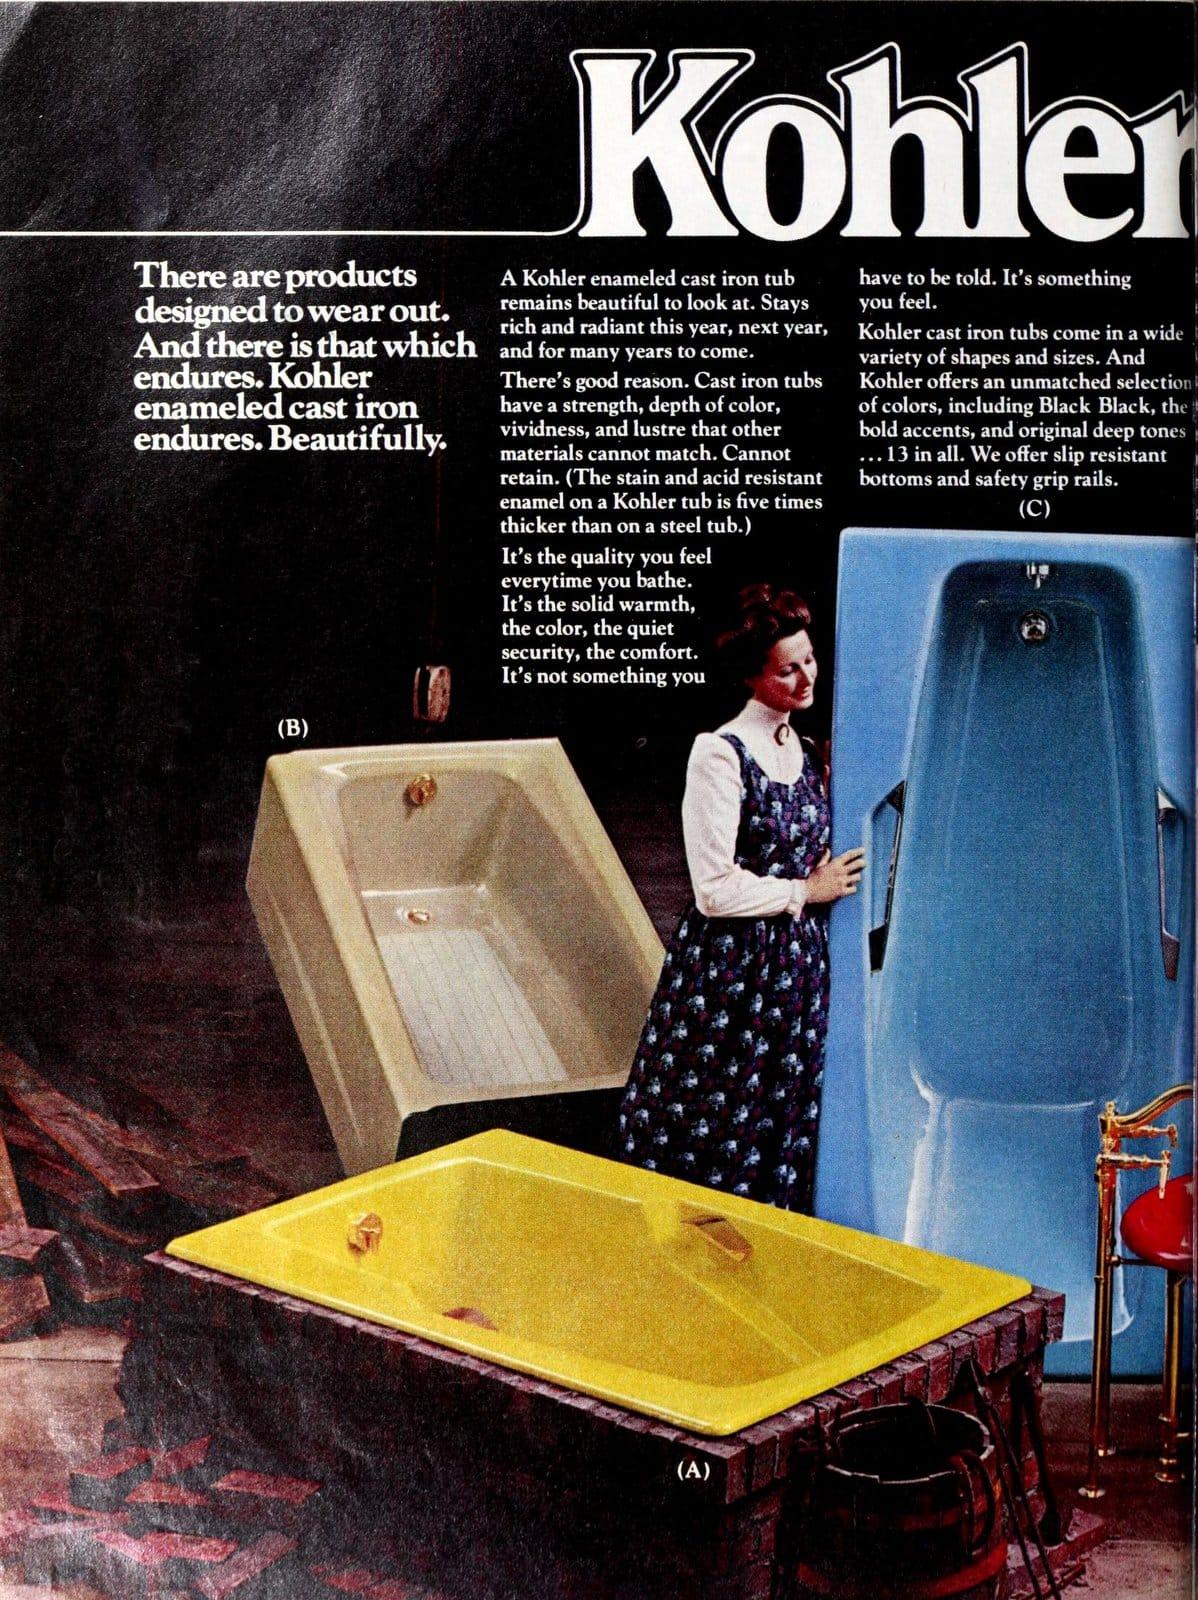 Bathroom fixtures - enameled cast iron KohlerEndurables from 1975 (2)